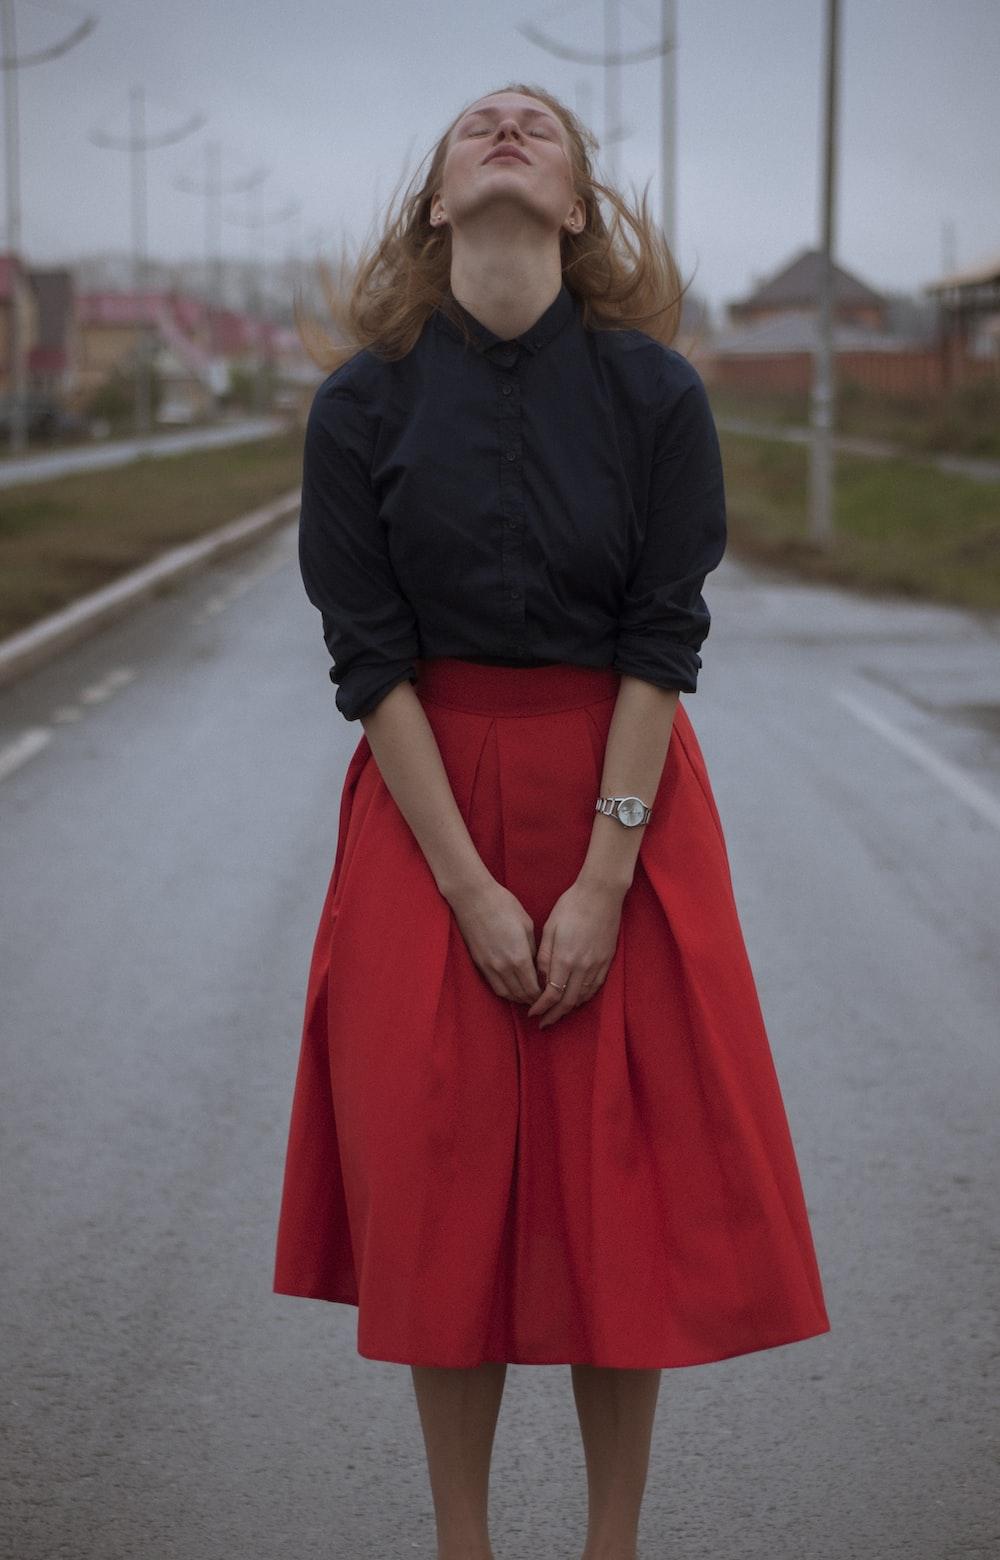 woman wearing black dress shirt and red long skirt